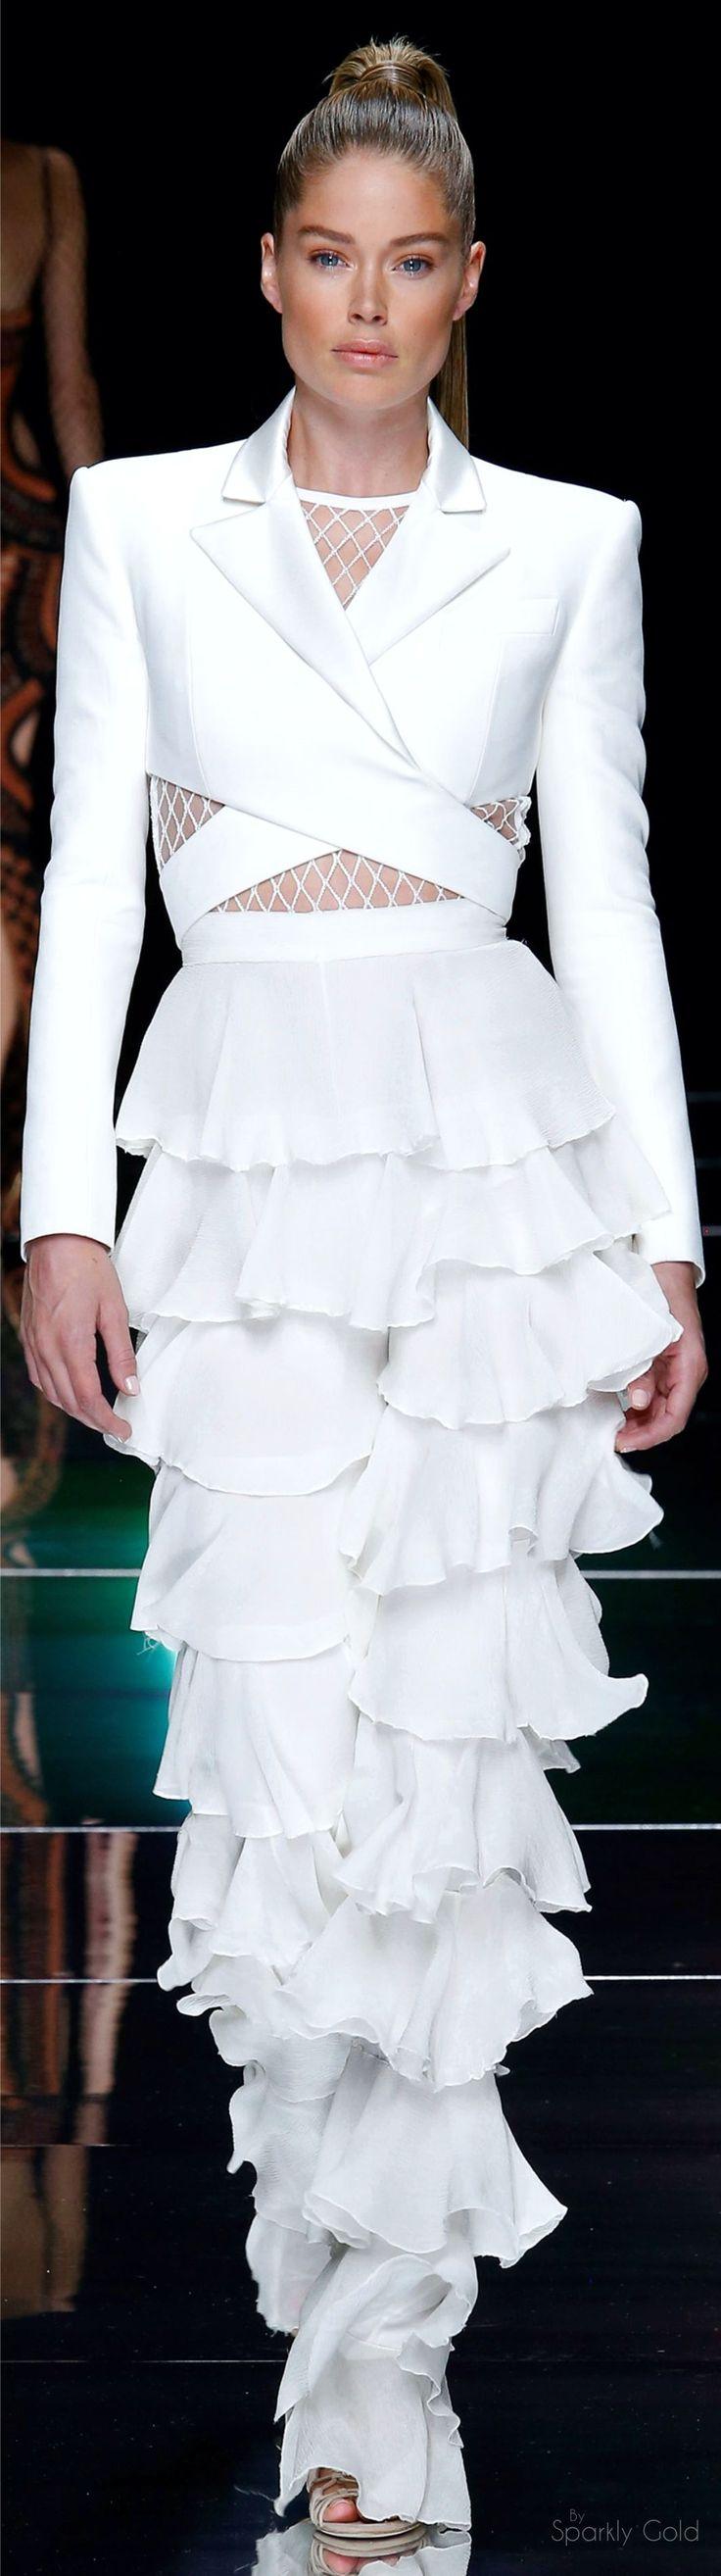 Balmain Spring 2016 RTW women fashion outfit clothing style apparel @roressclothes closet ideas